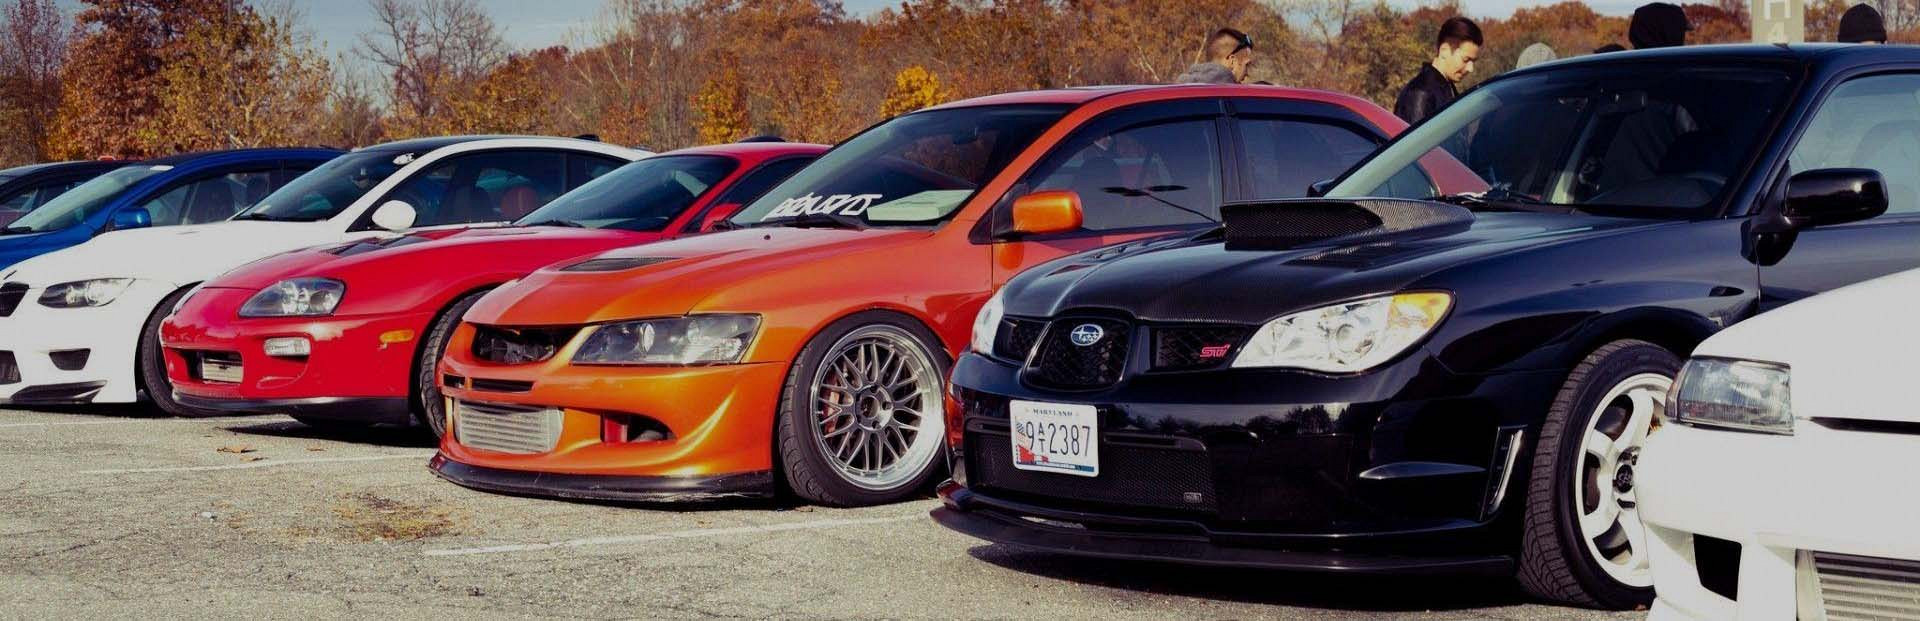 Carteam Smink